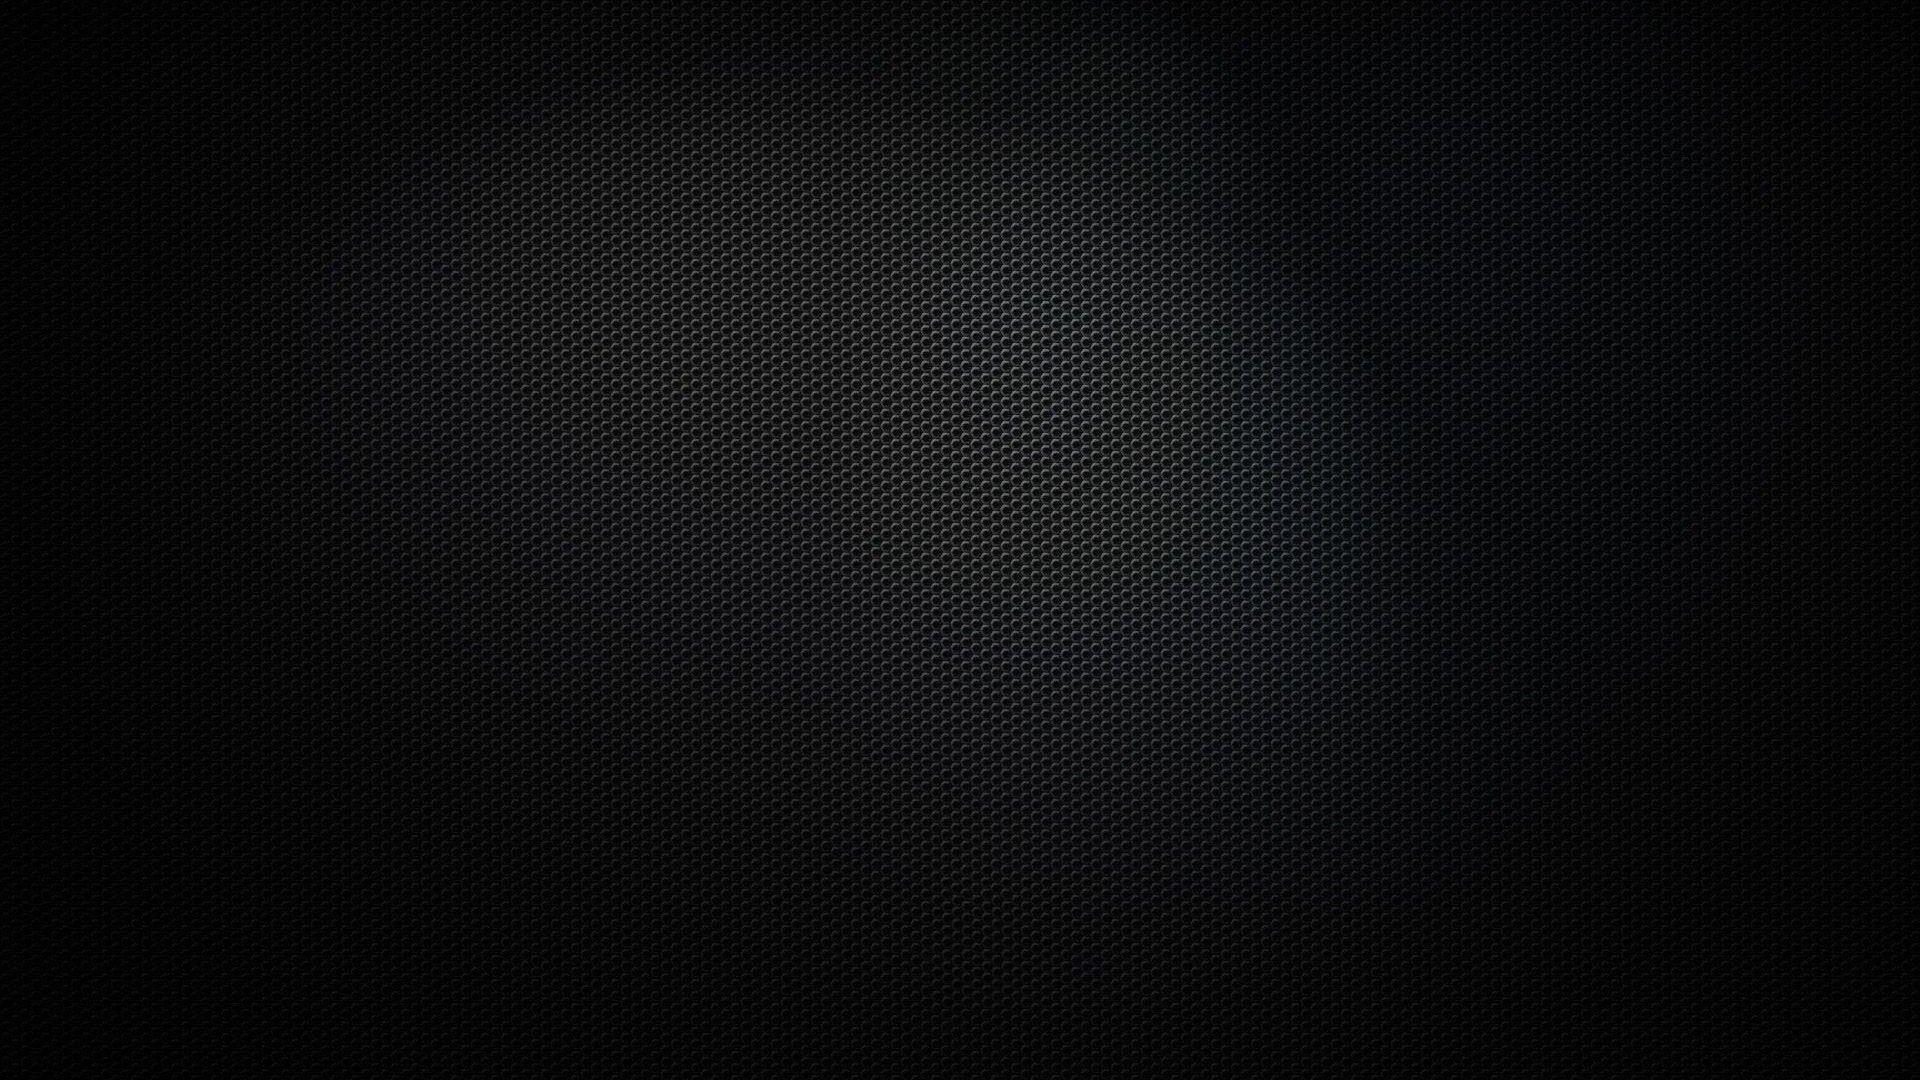 black desktop background wallpaper